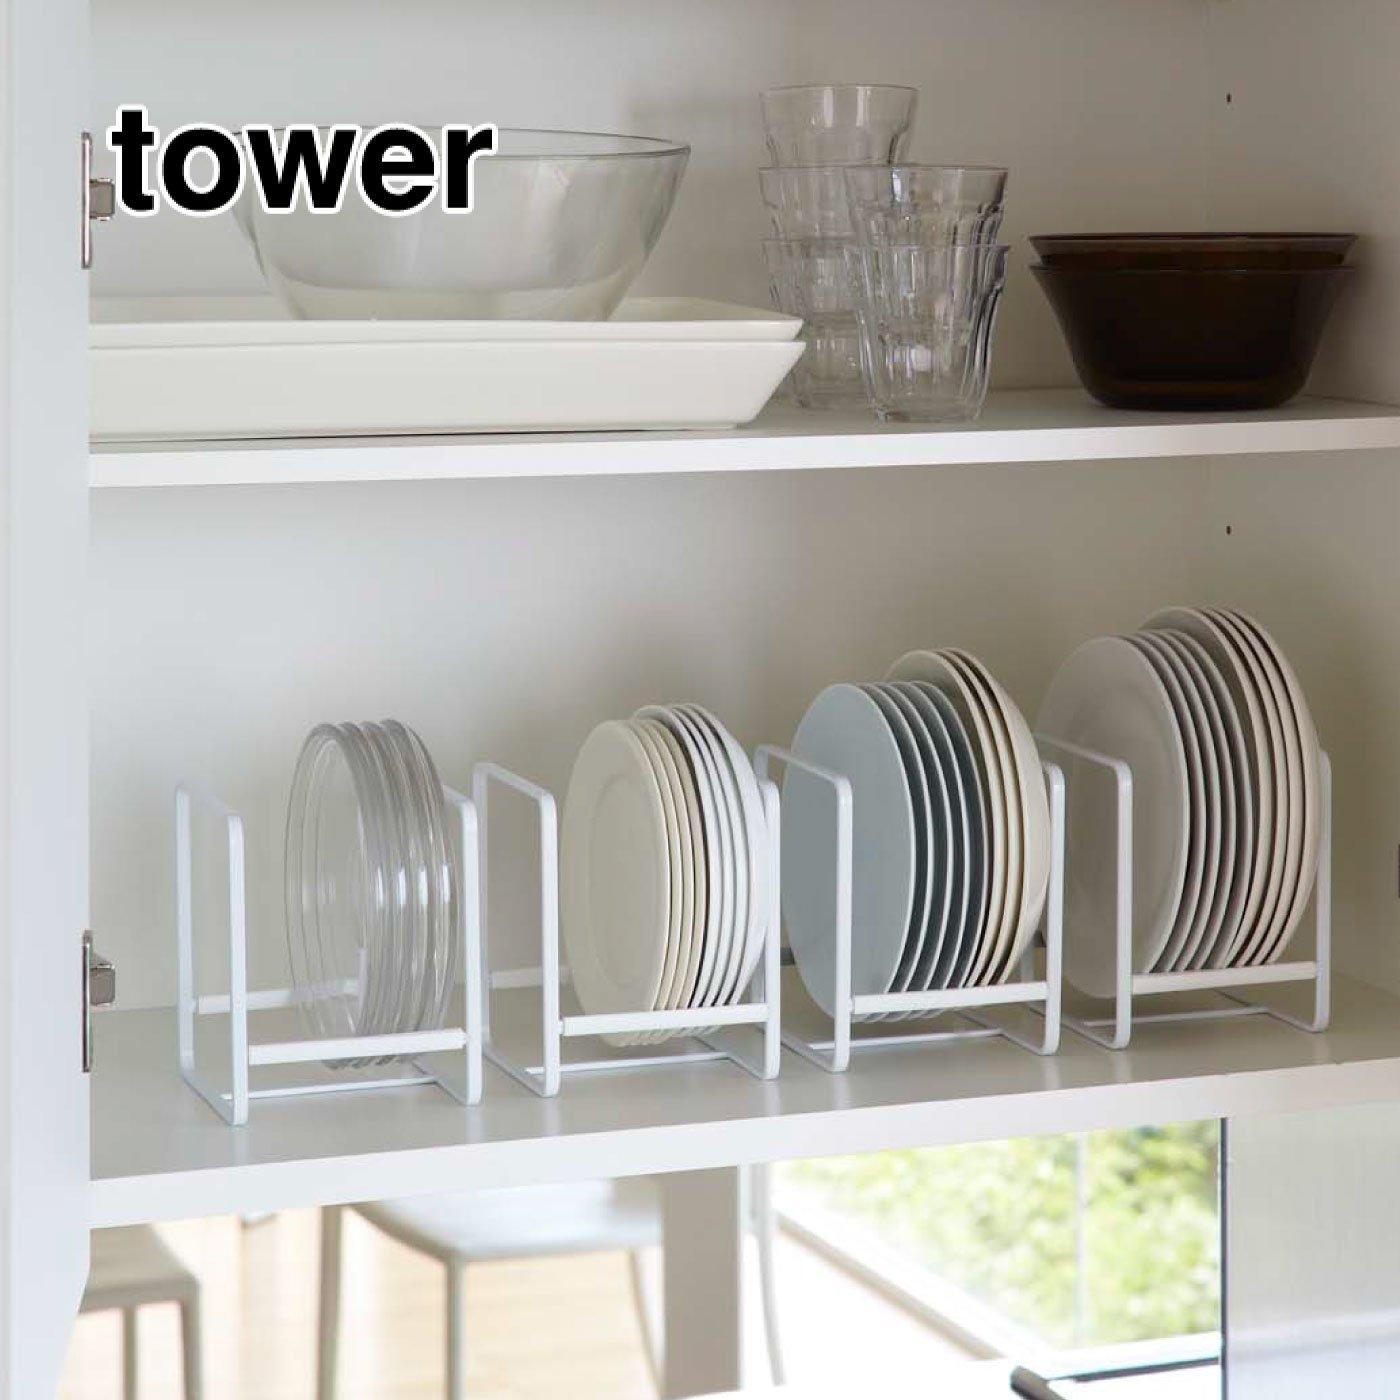 tower ディッシュラック Sサイズ